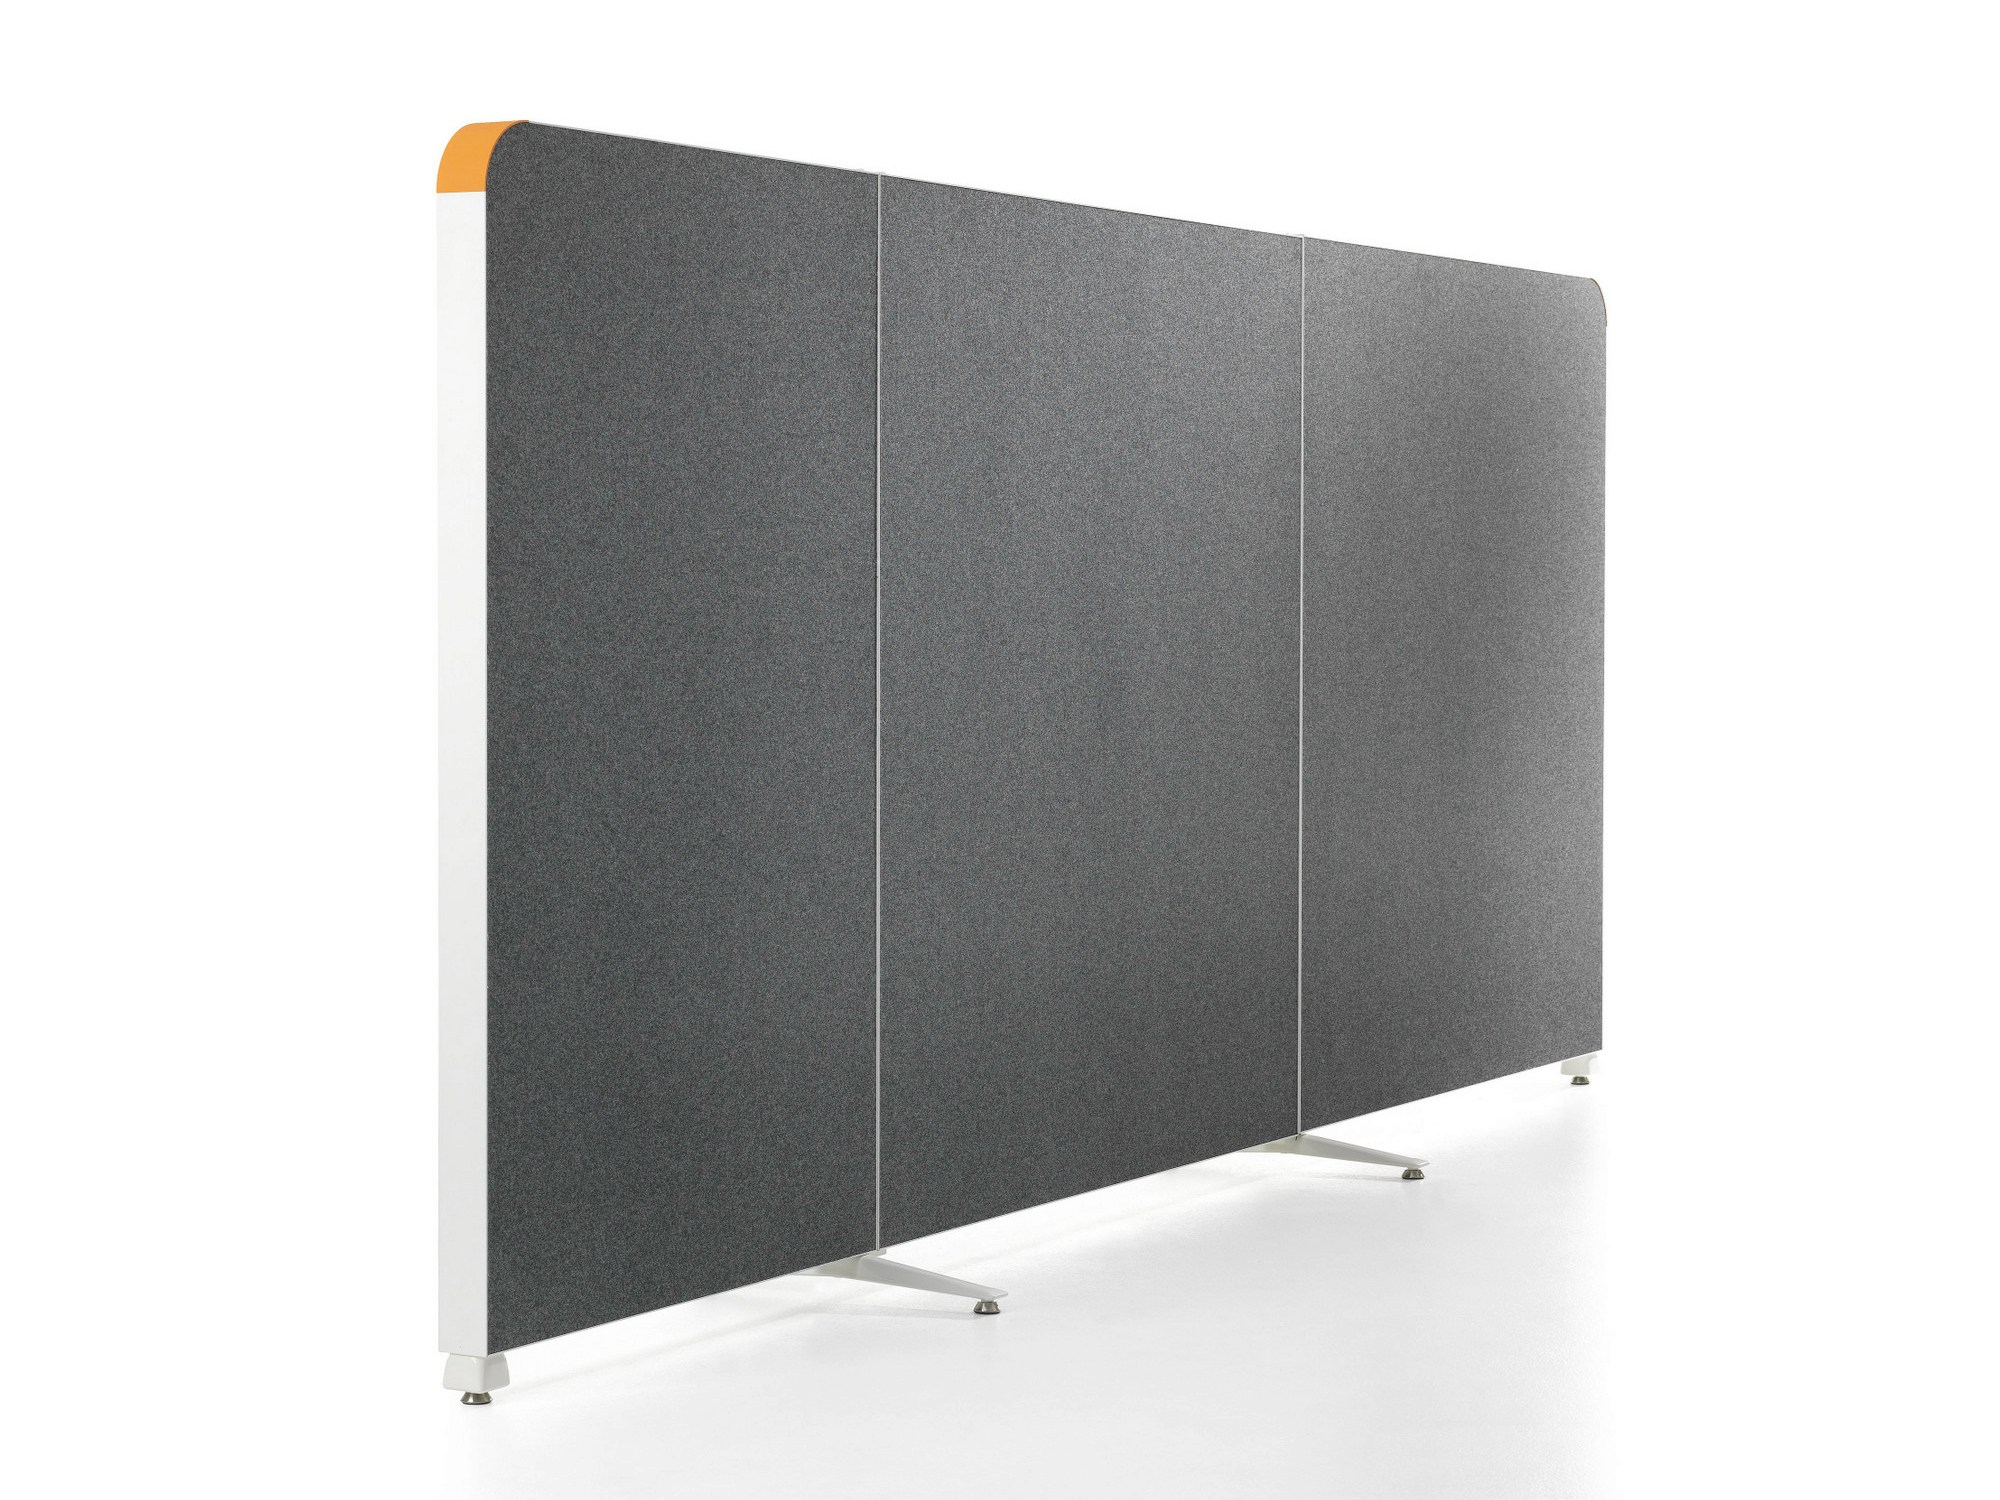 panneau s parateur insonorisant modulable alumi curves by abstracta design nina jobs. Black Bedroom Furniture Sets. Home Design Ideas